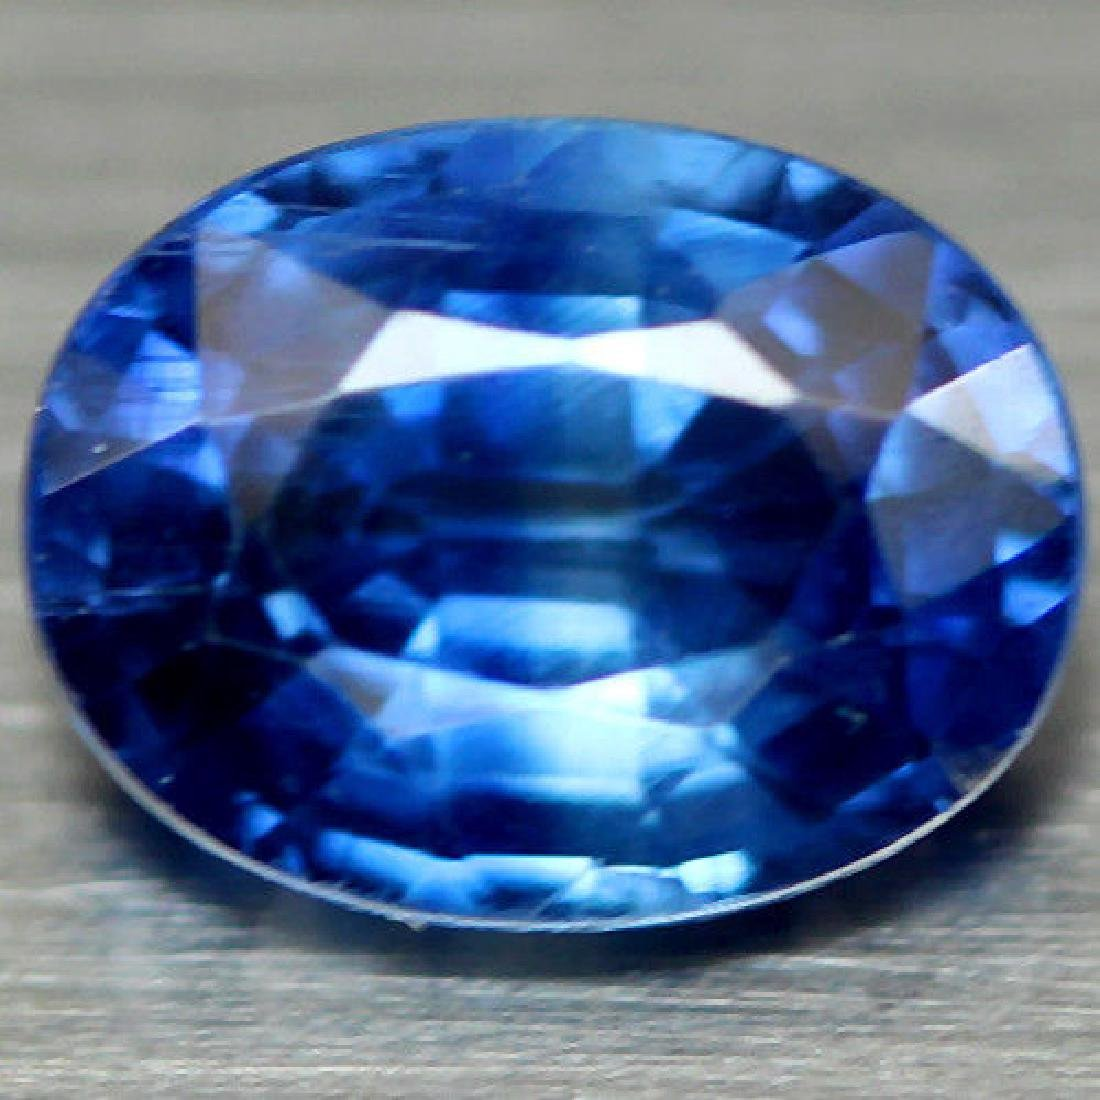 0.92 CT NATURAL! BLUE NEPAL KYANITE OVAL